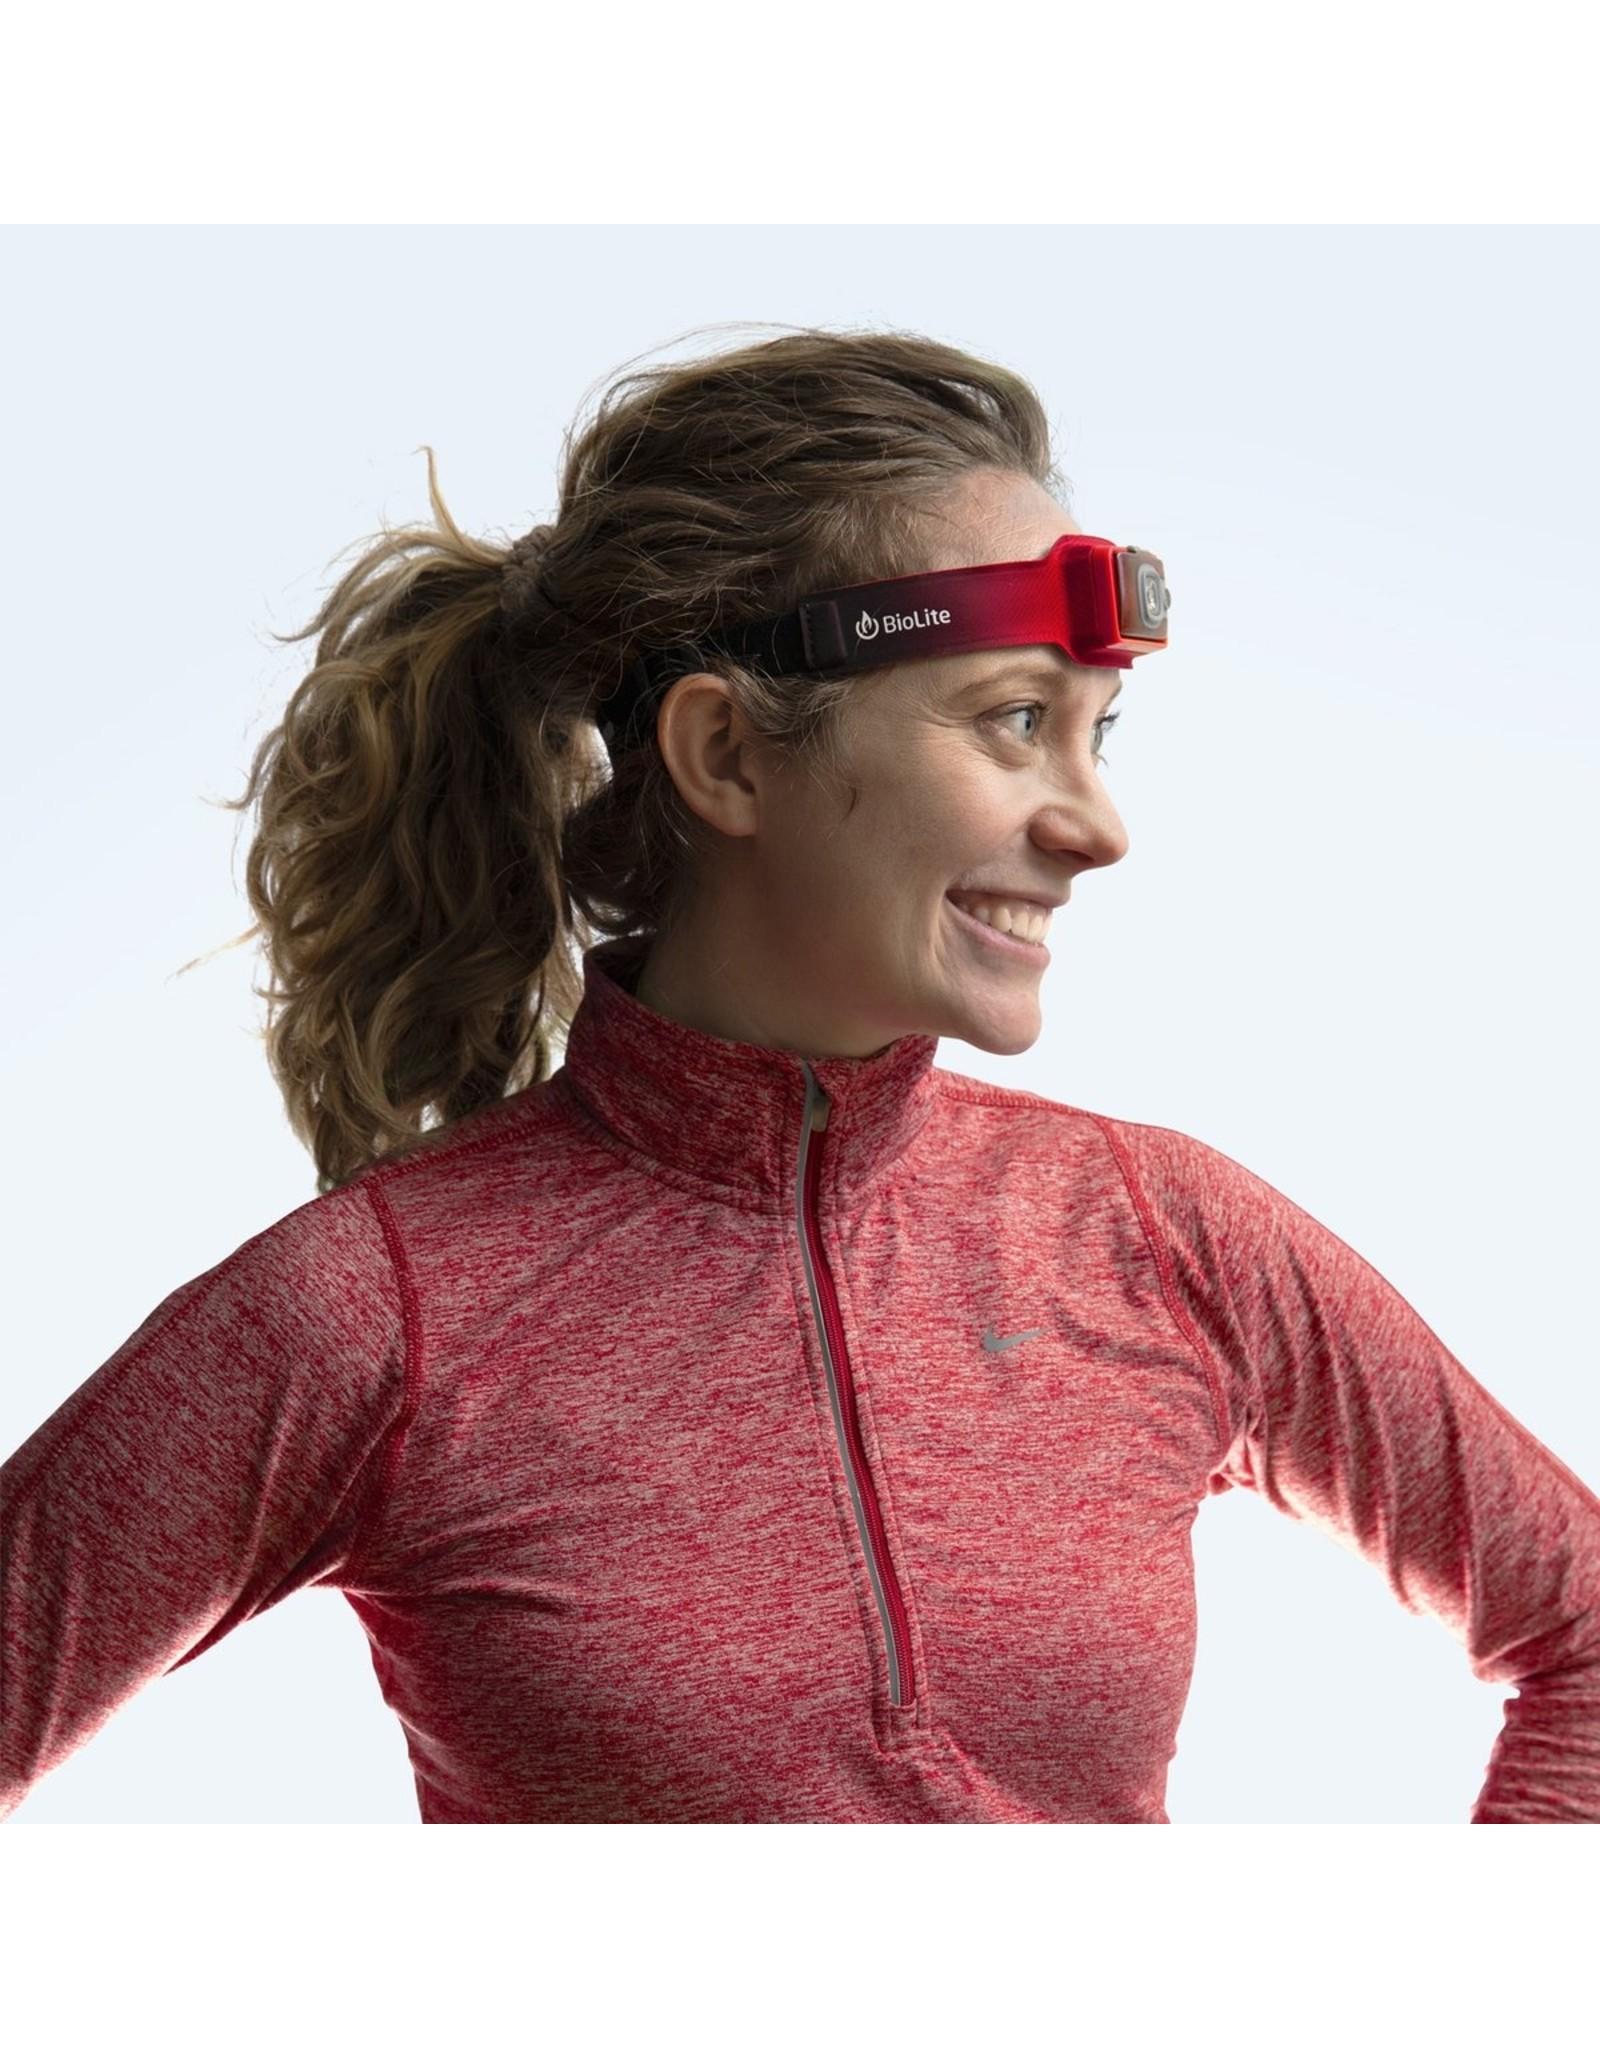 BioLite HeadLamp 200 - Ember Red